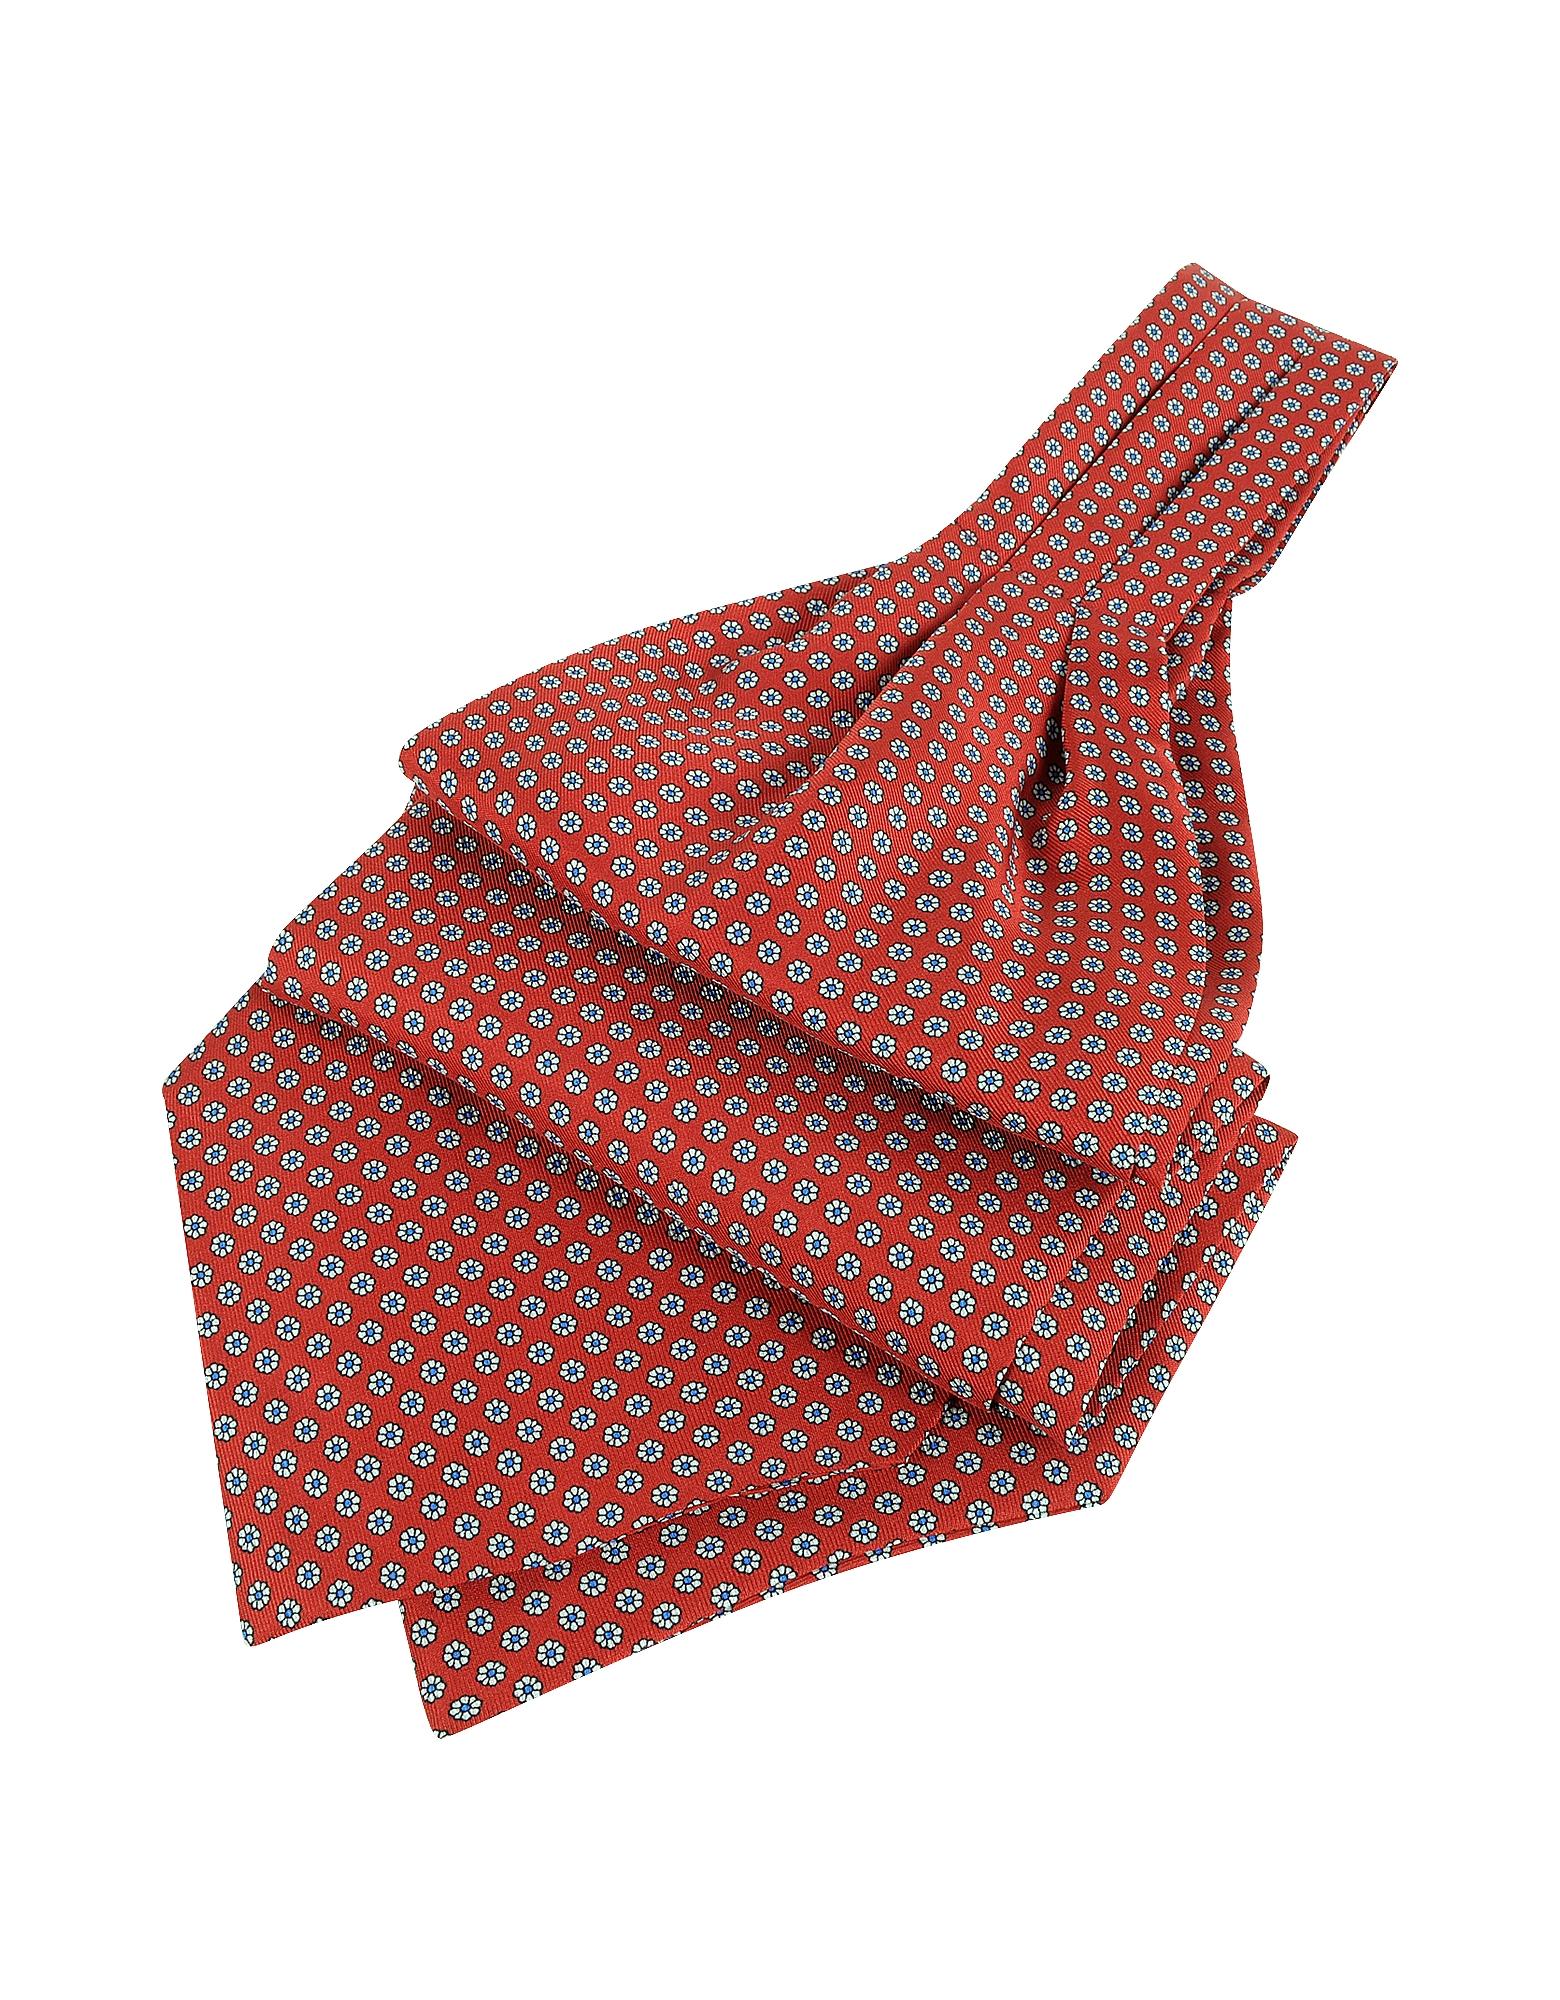 Forzieri Ascot ties, Daisy Print Pure Silk Ascot